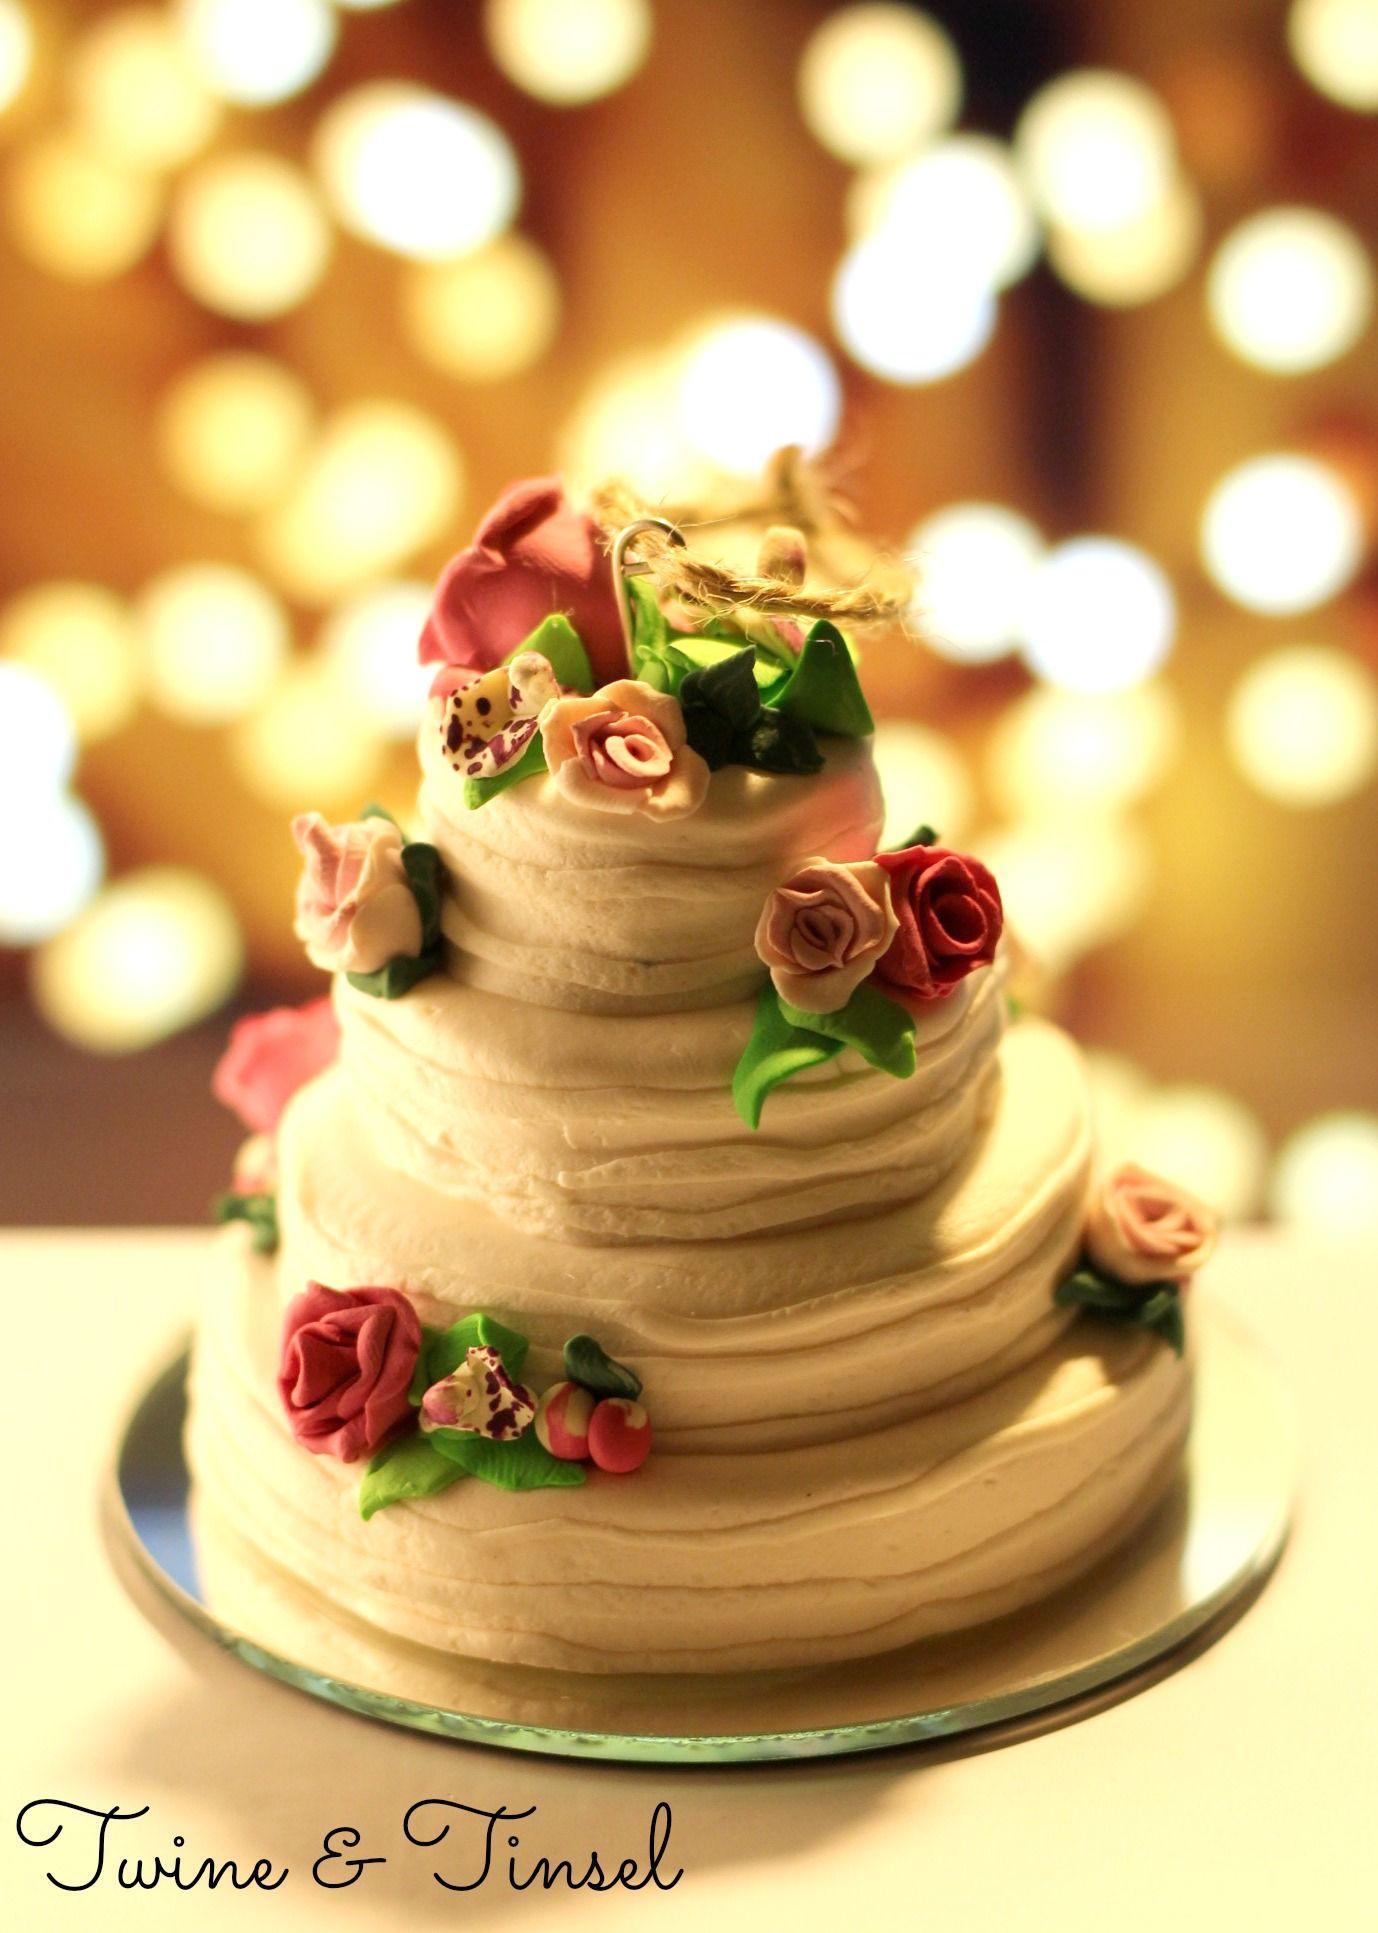 Custom Polymer Clay Miniature Wedding Cake Ornaments   Etsy   Twine ...